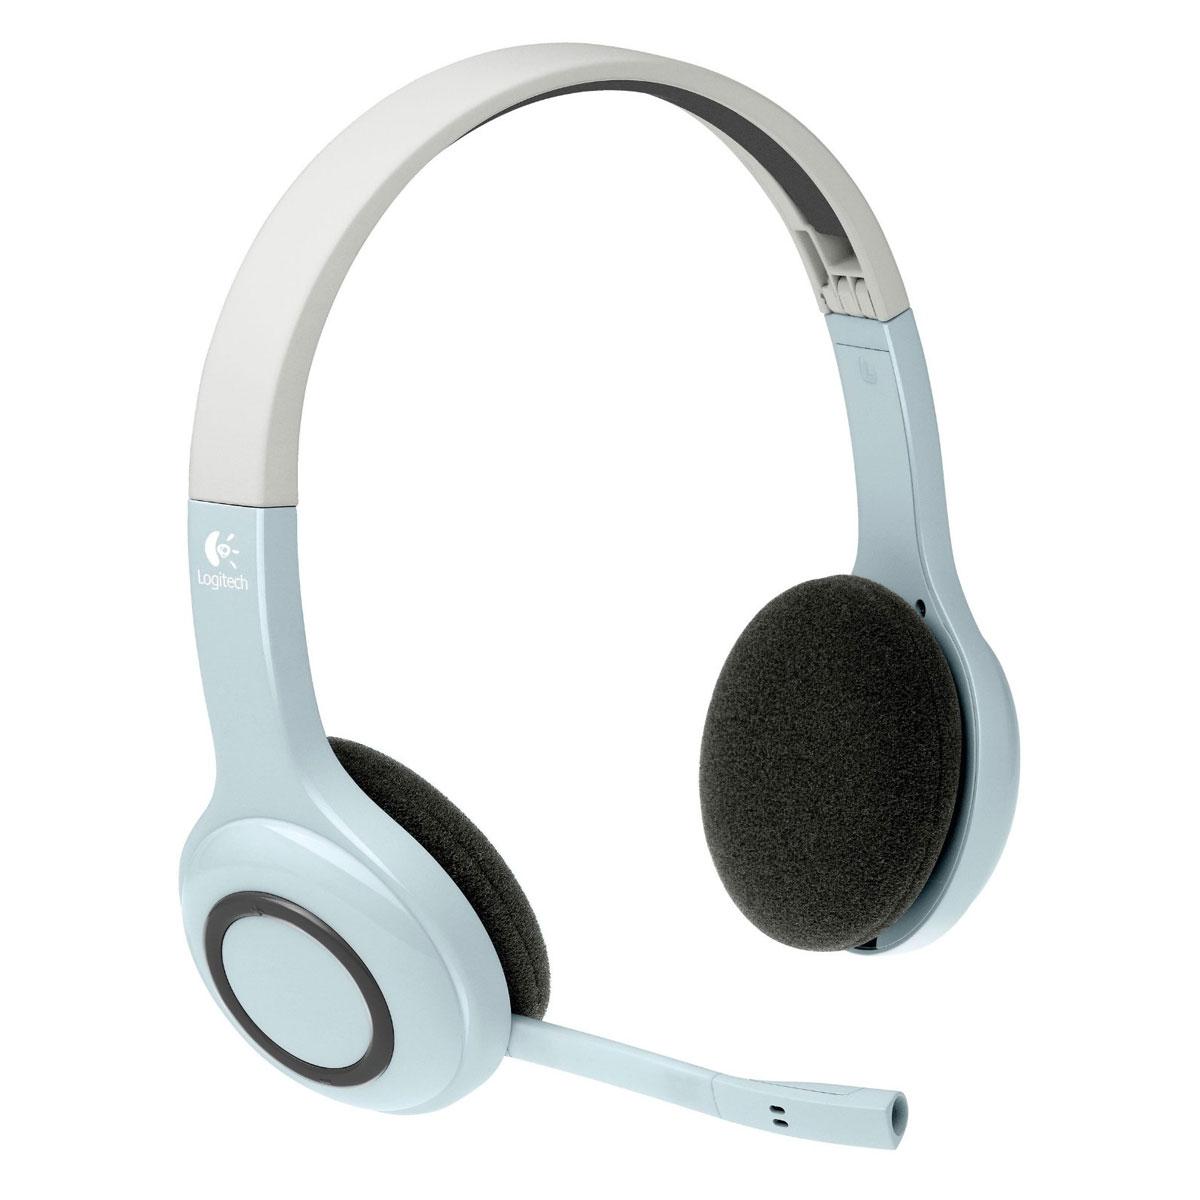 Logitech Wireless Headset H609 For Ipad Micro Casque